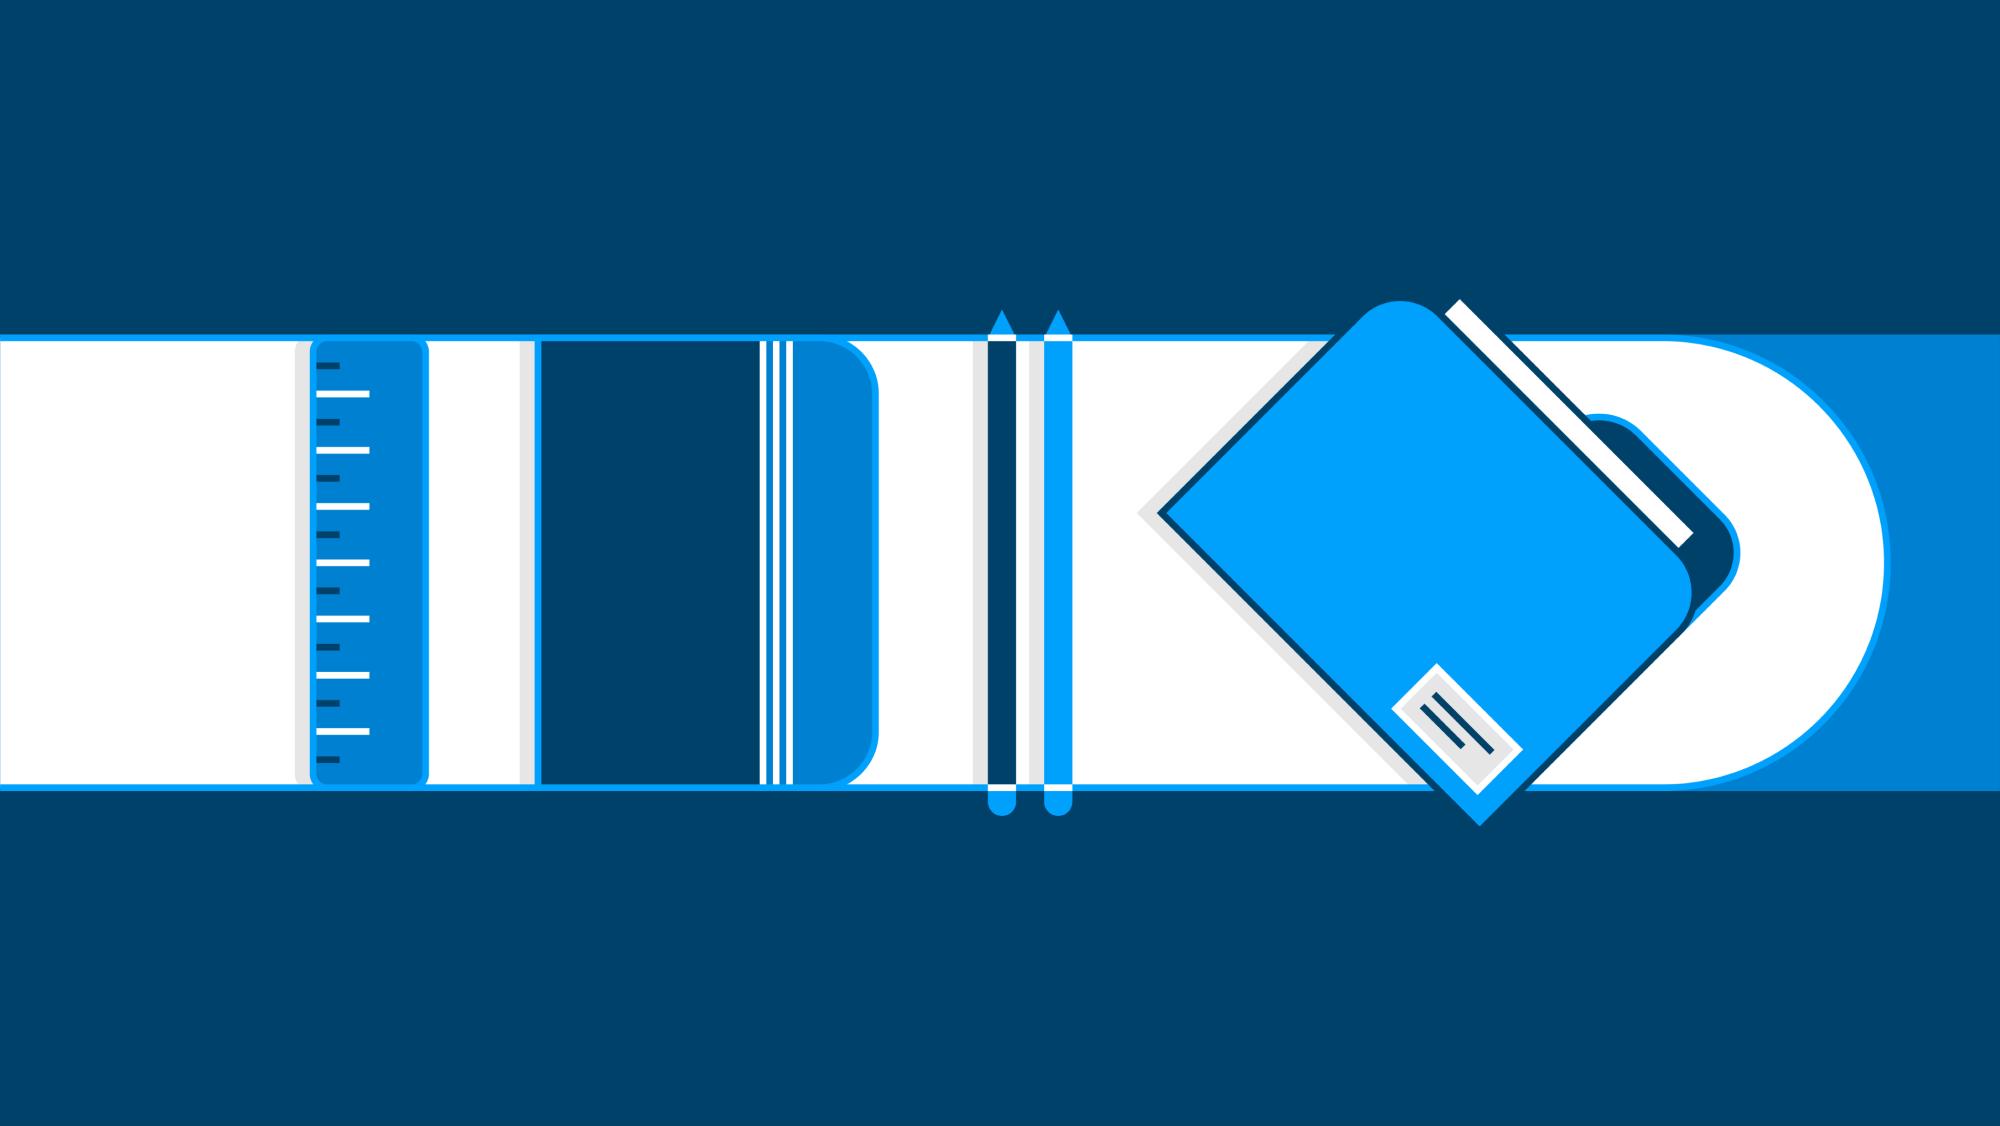 Illustration of paperwork